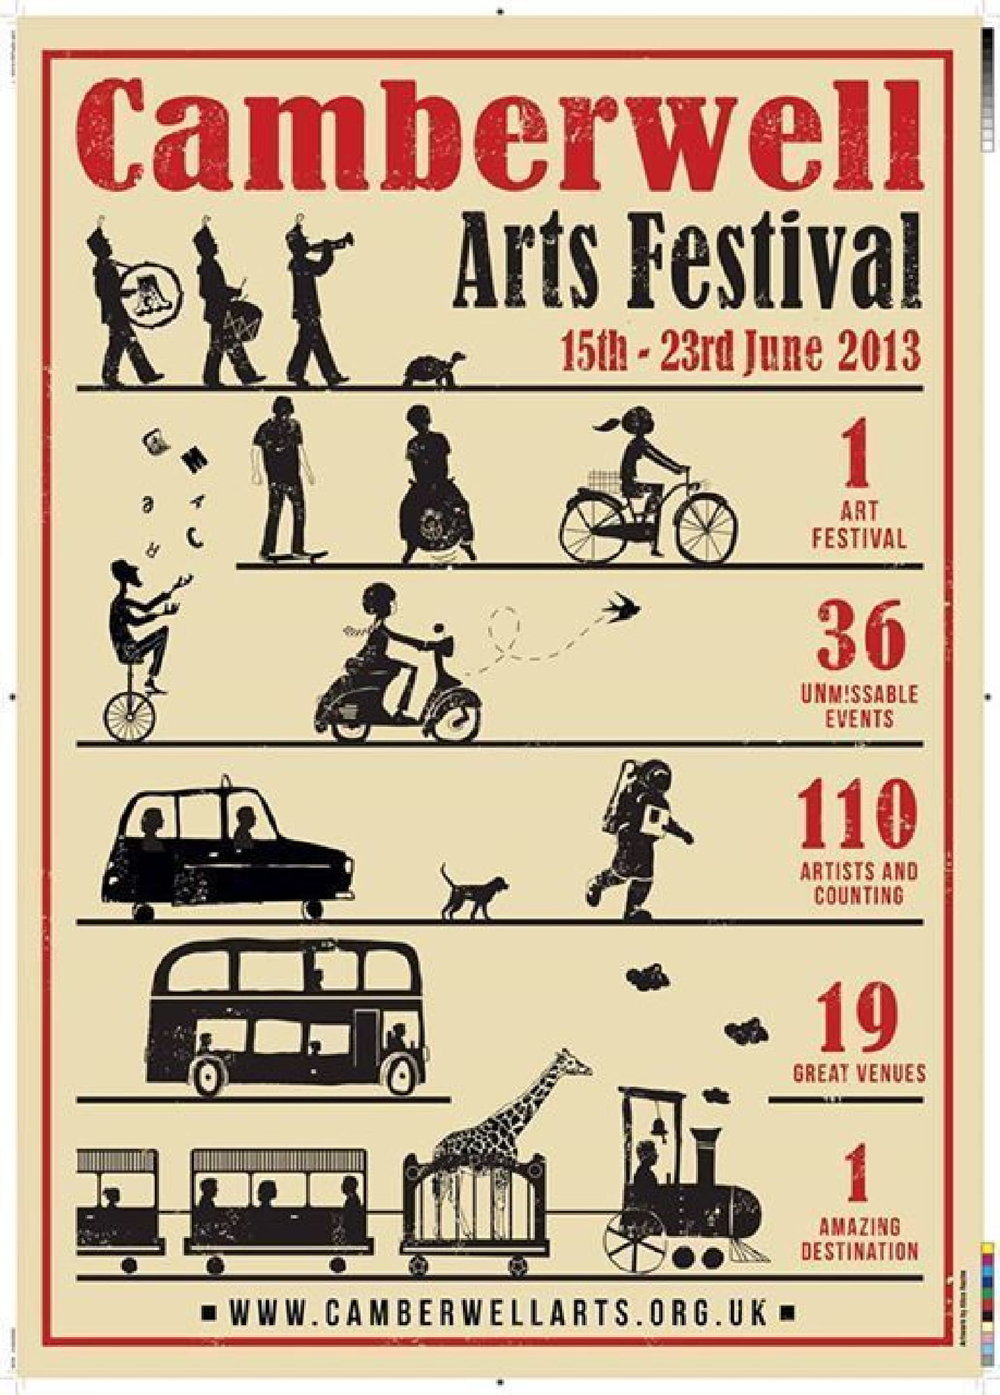 2013 Summer - Camberwell Arts Festival 2013